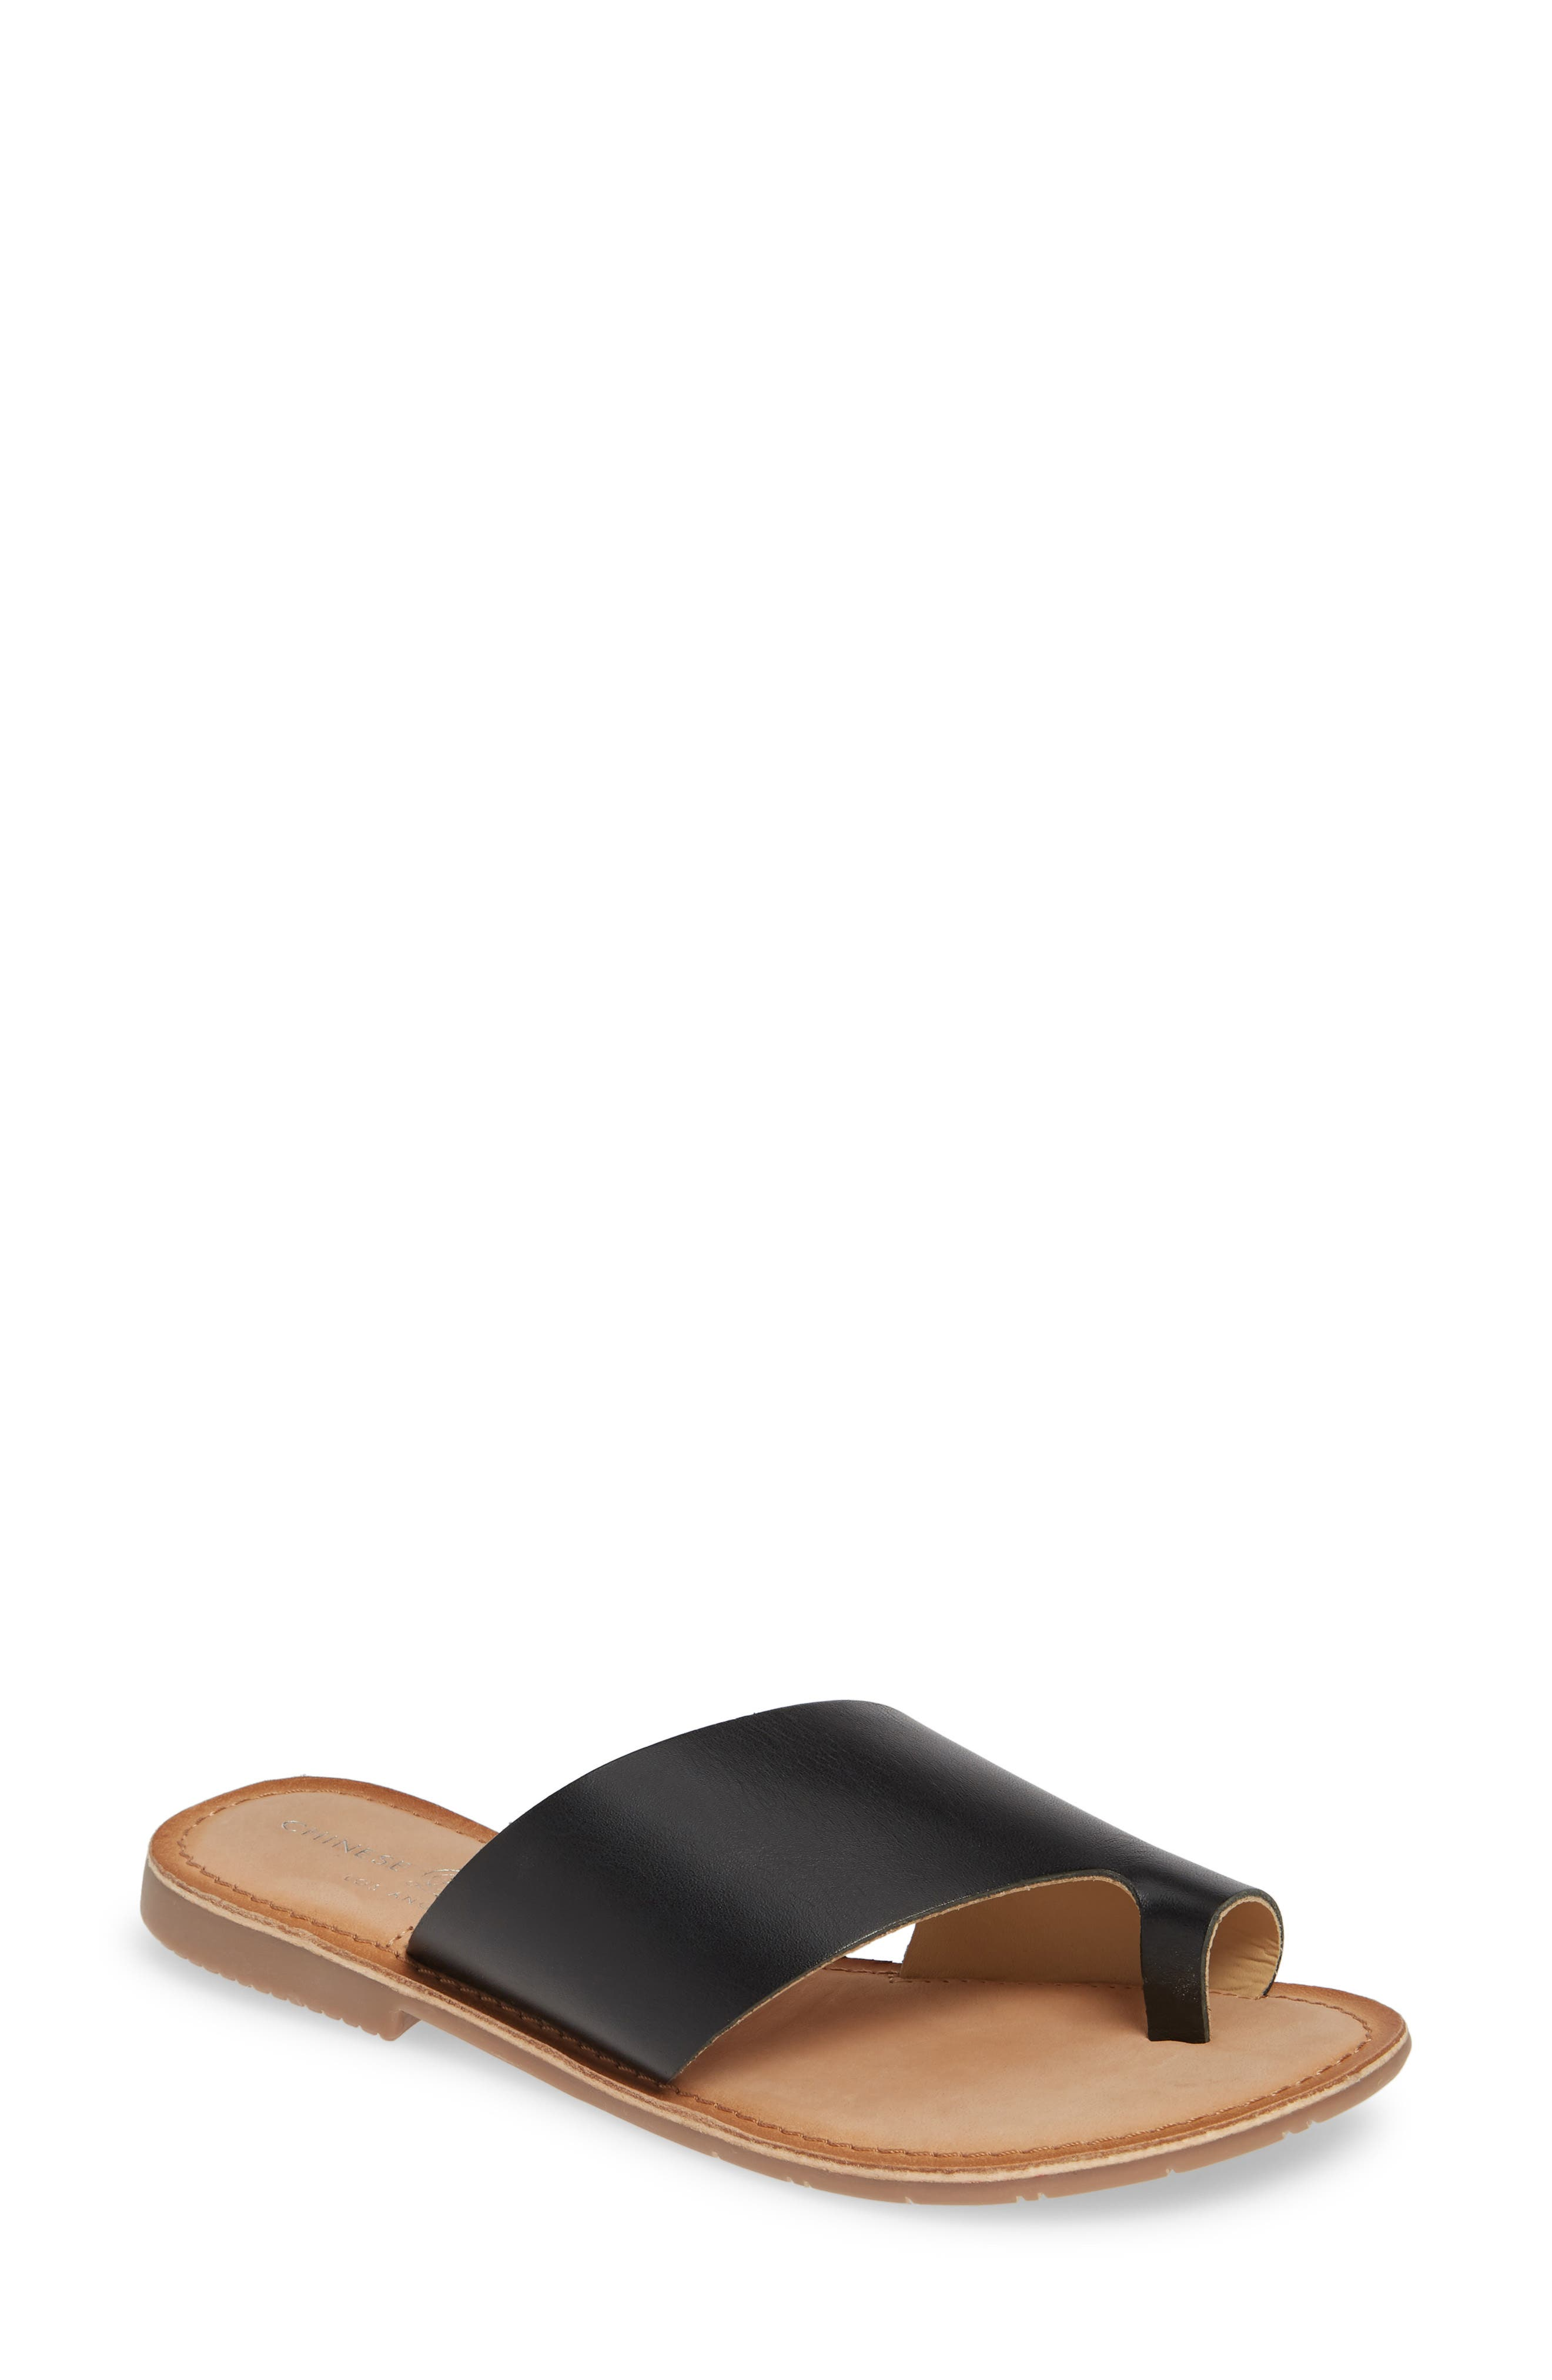 CHINESE LAUNDRY Gemmy Slide Sandal, Main, color, BLACK LEATHER